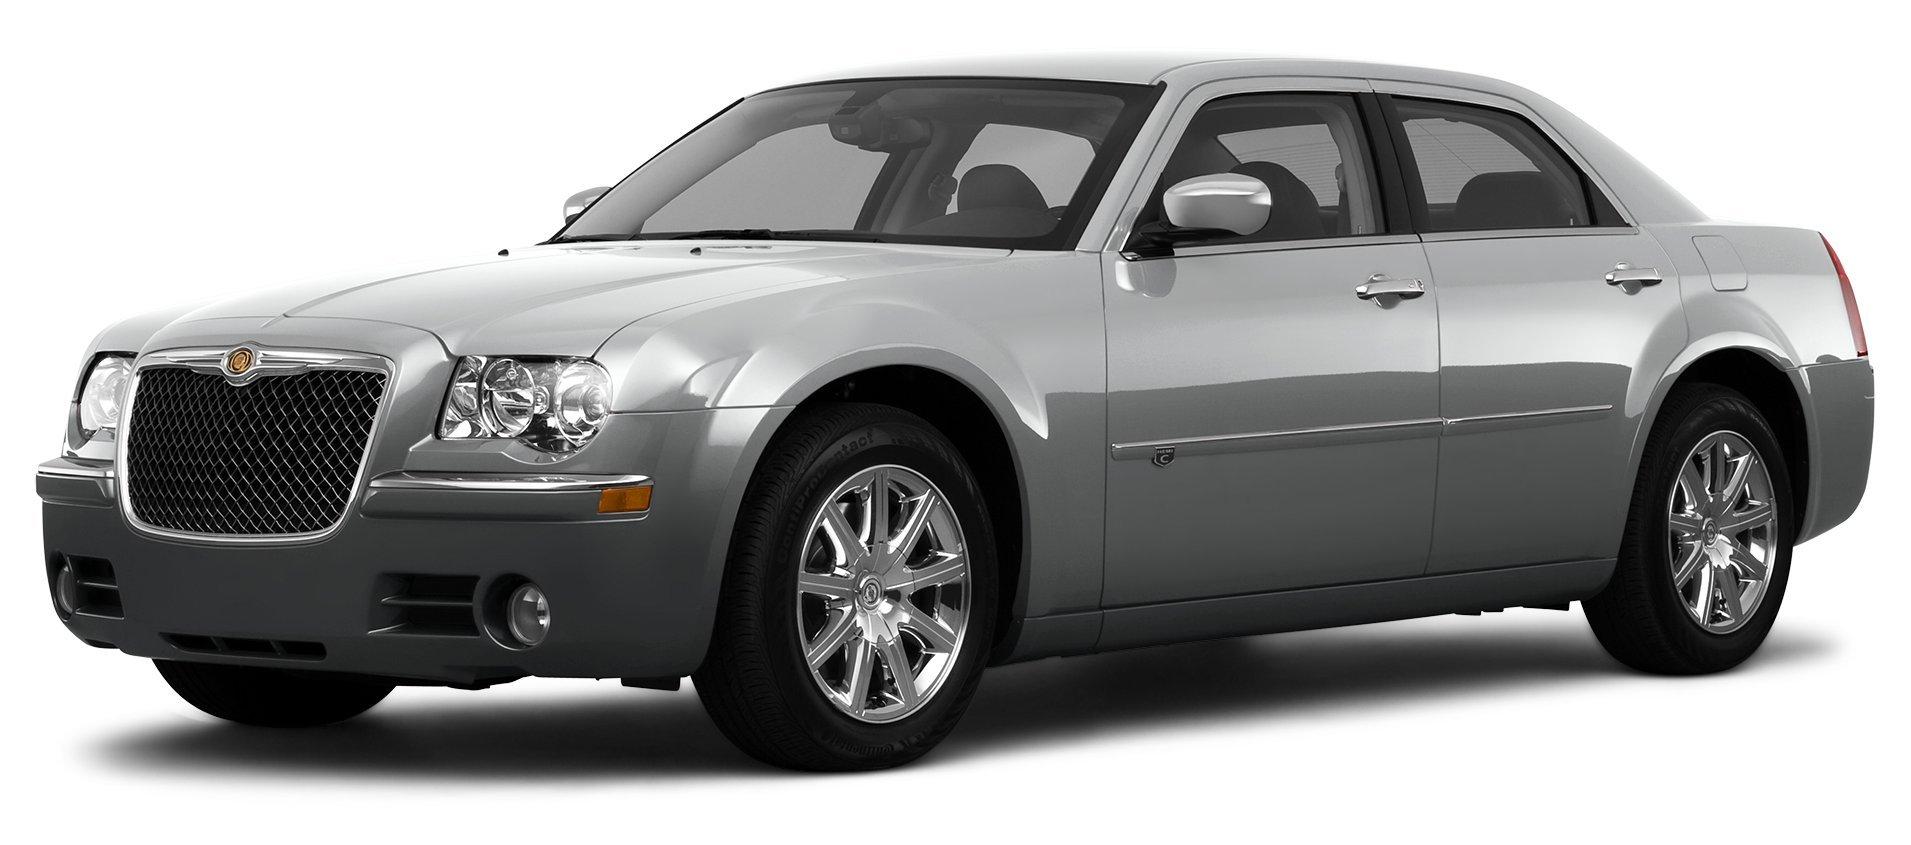 2010 chrysler 300 300c 4 door sedan all wheel drive